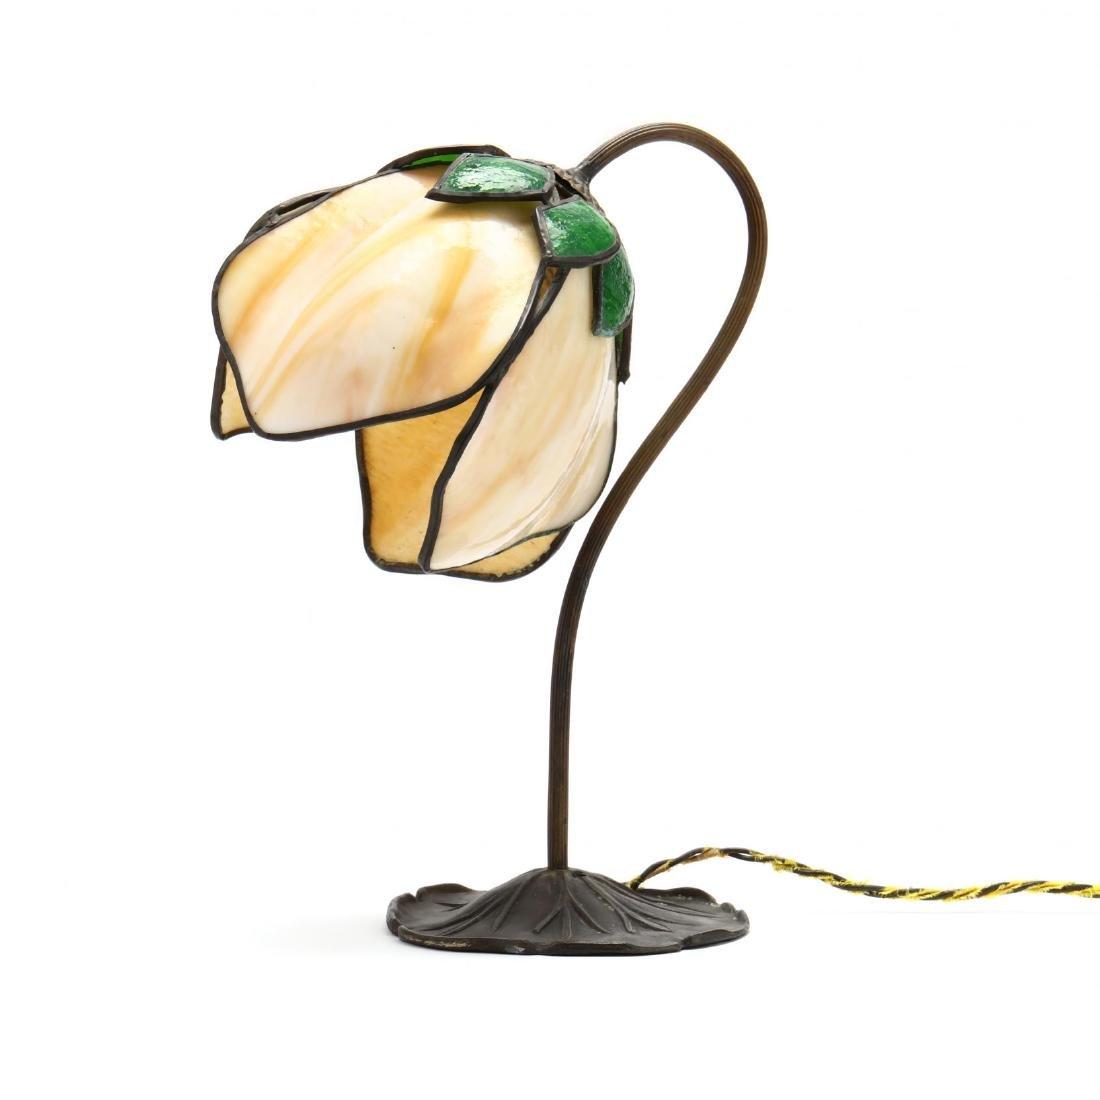 Vintage Slag Glass Tulip Form Table Lamp